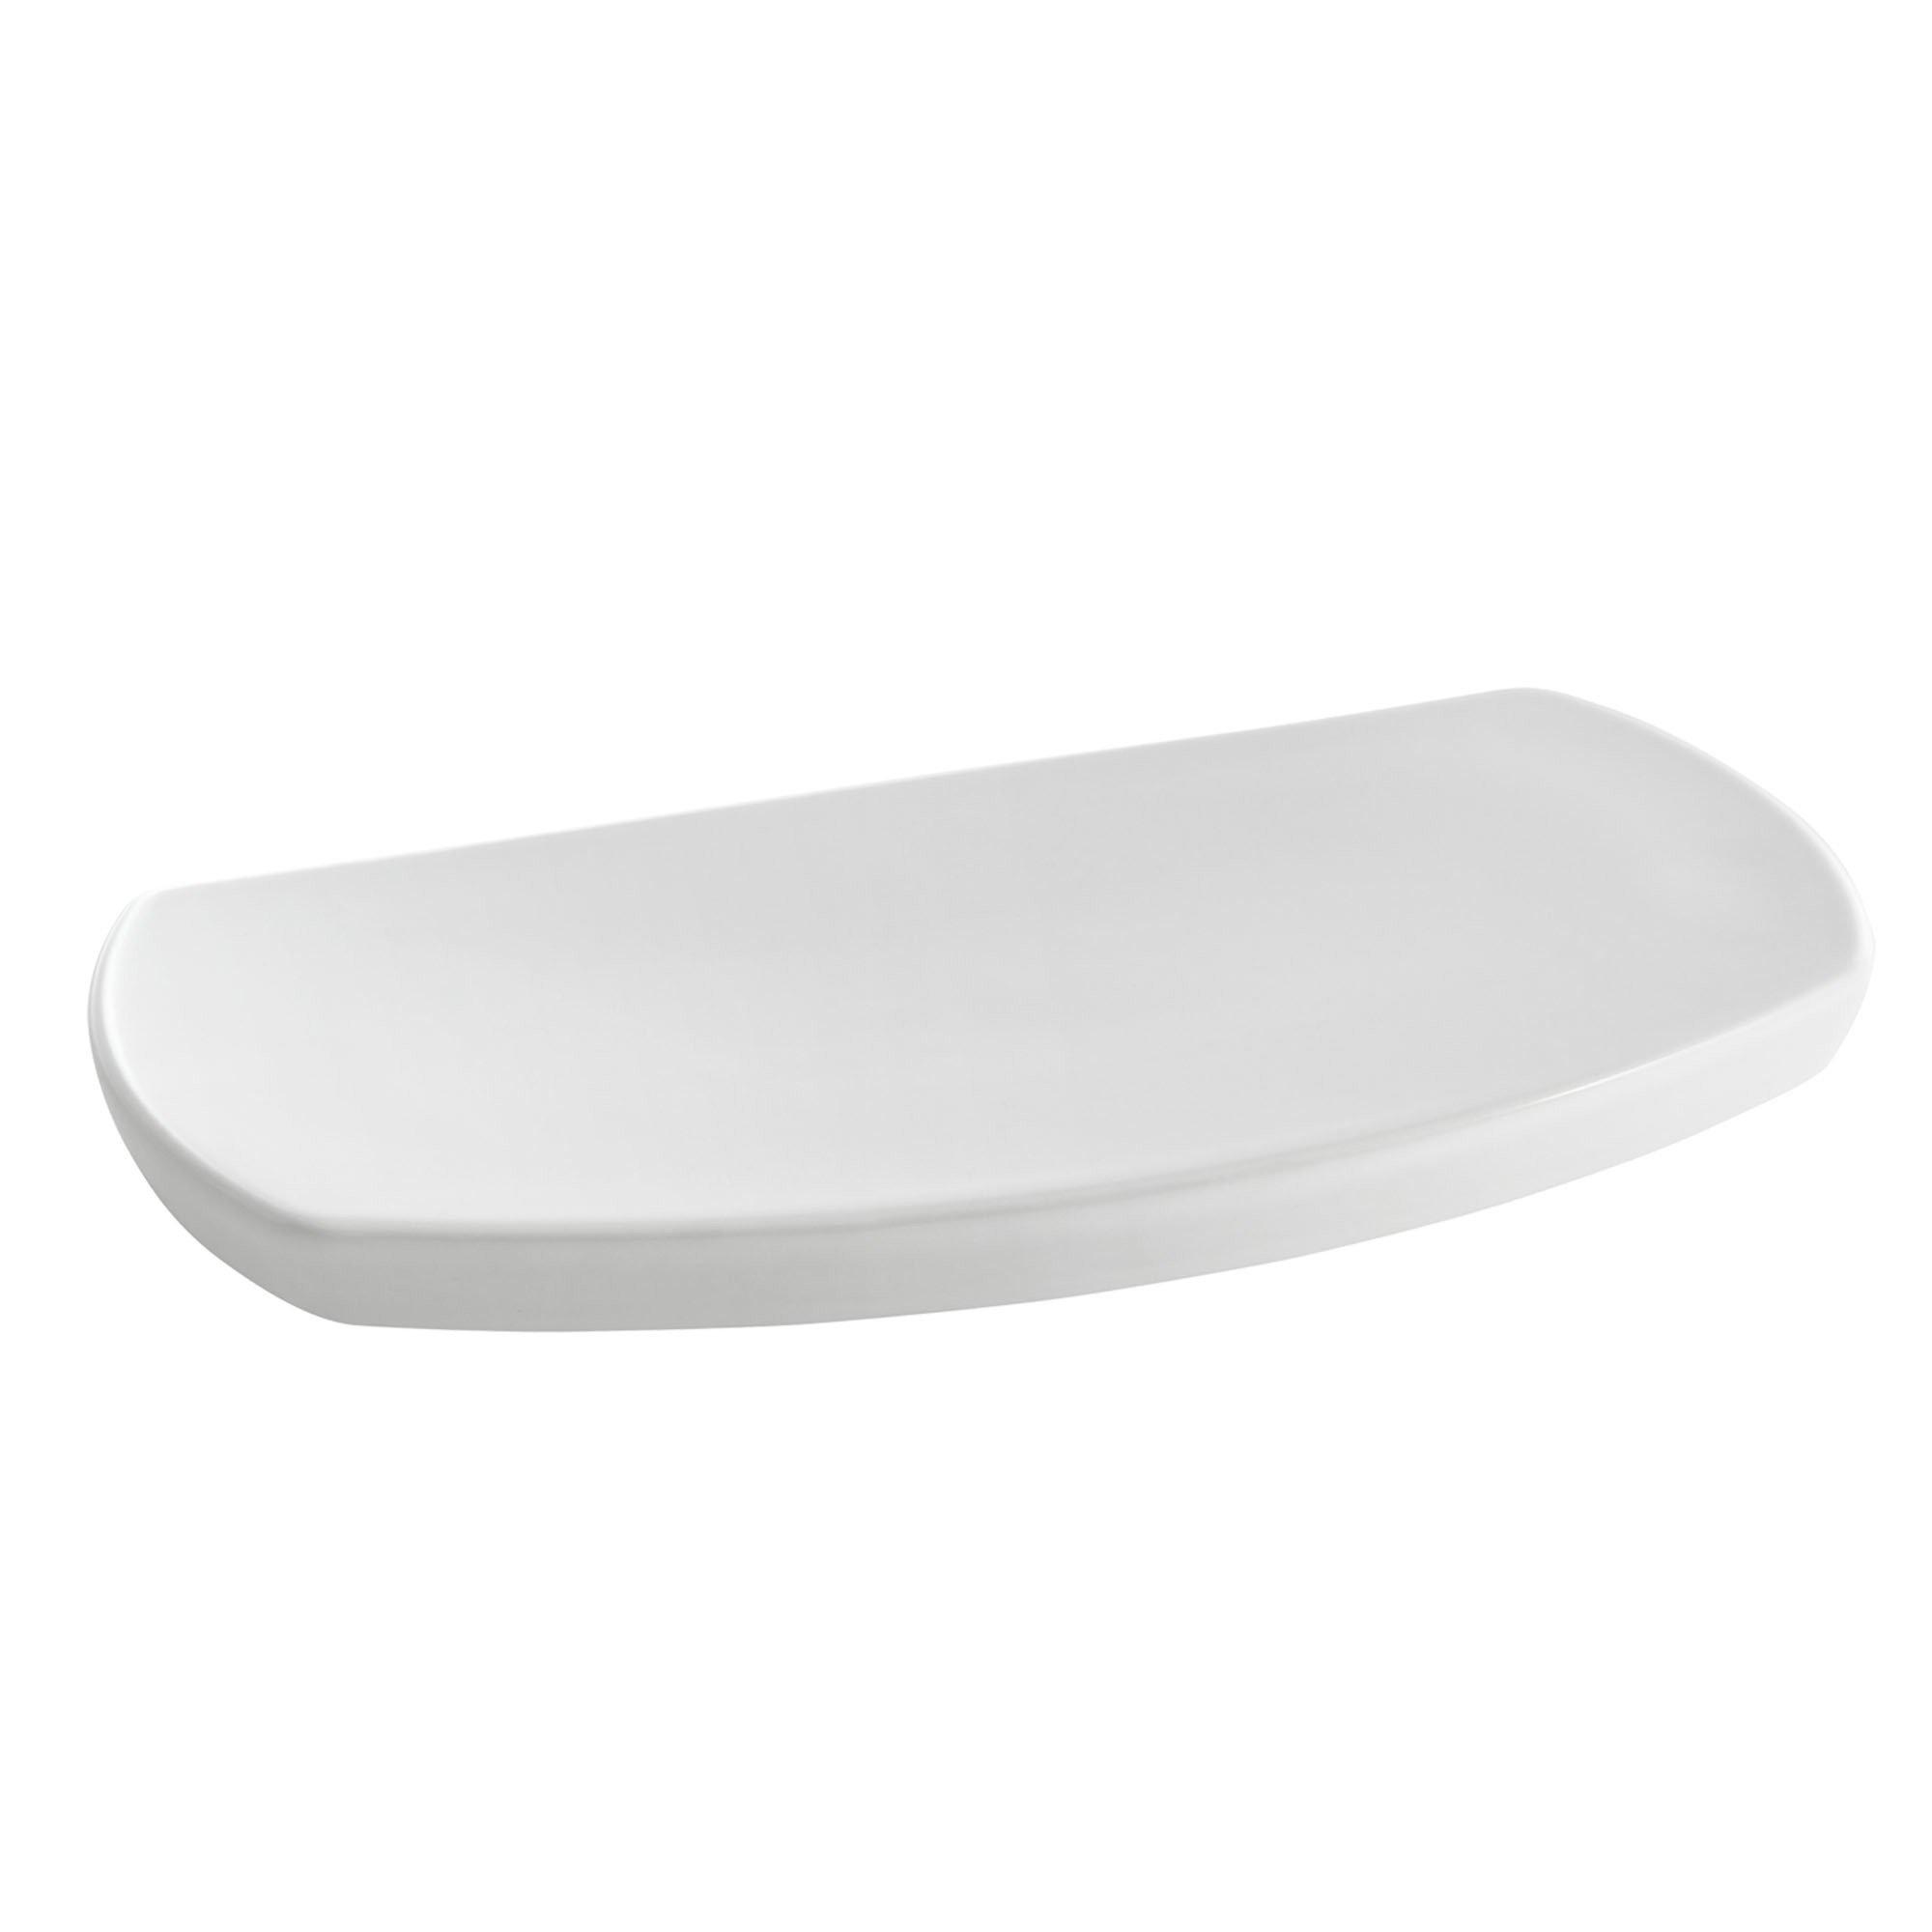 American Standard 735214-400.020 Edgemere Toilet Tank Cover White